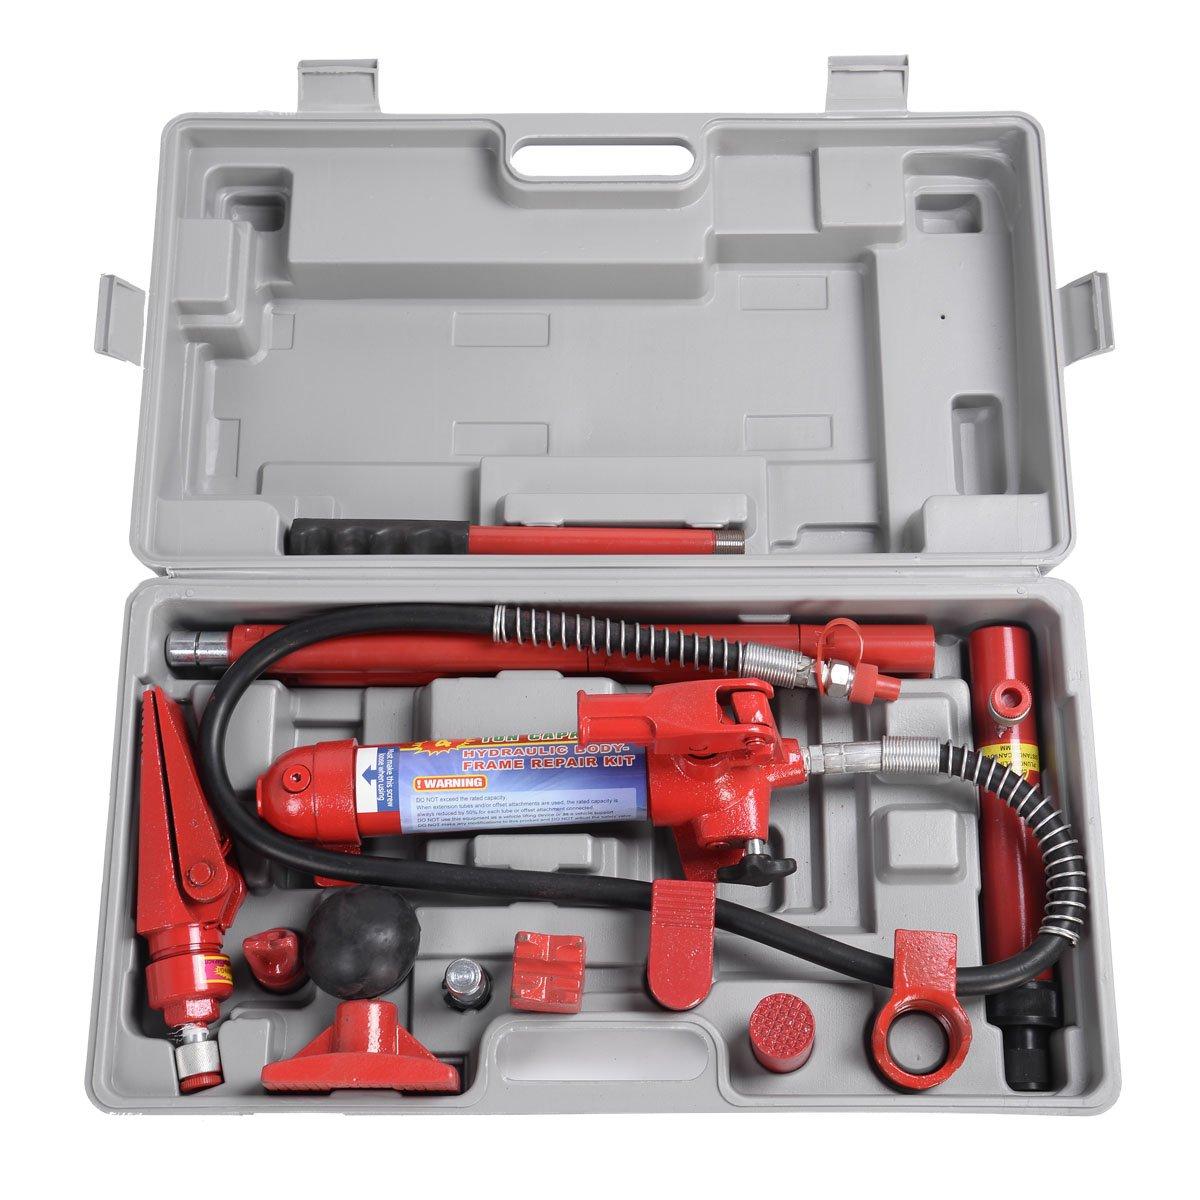 Goplus 4 Ton Porta Power Hydraulic Jack Body Frame Repair Kit Auto Shop Tool Heavy Set w/ Carrying Case by Goplus (Image #2)